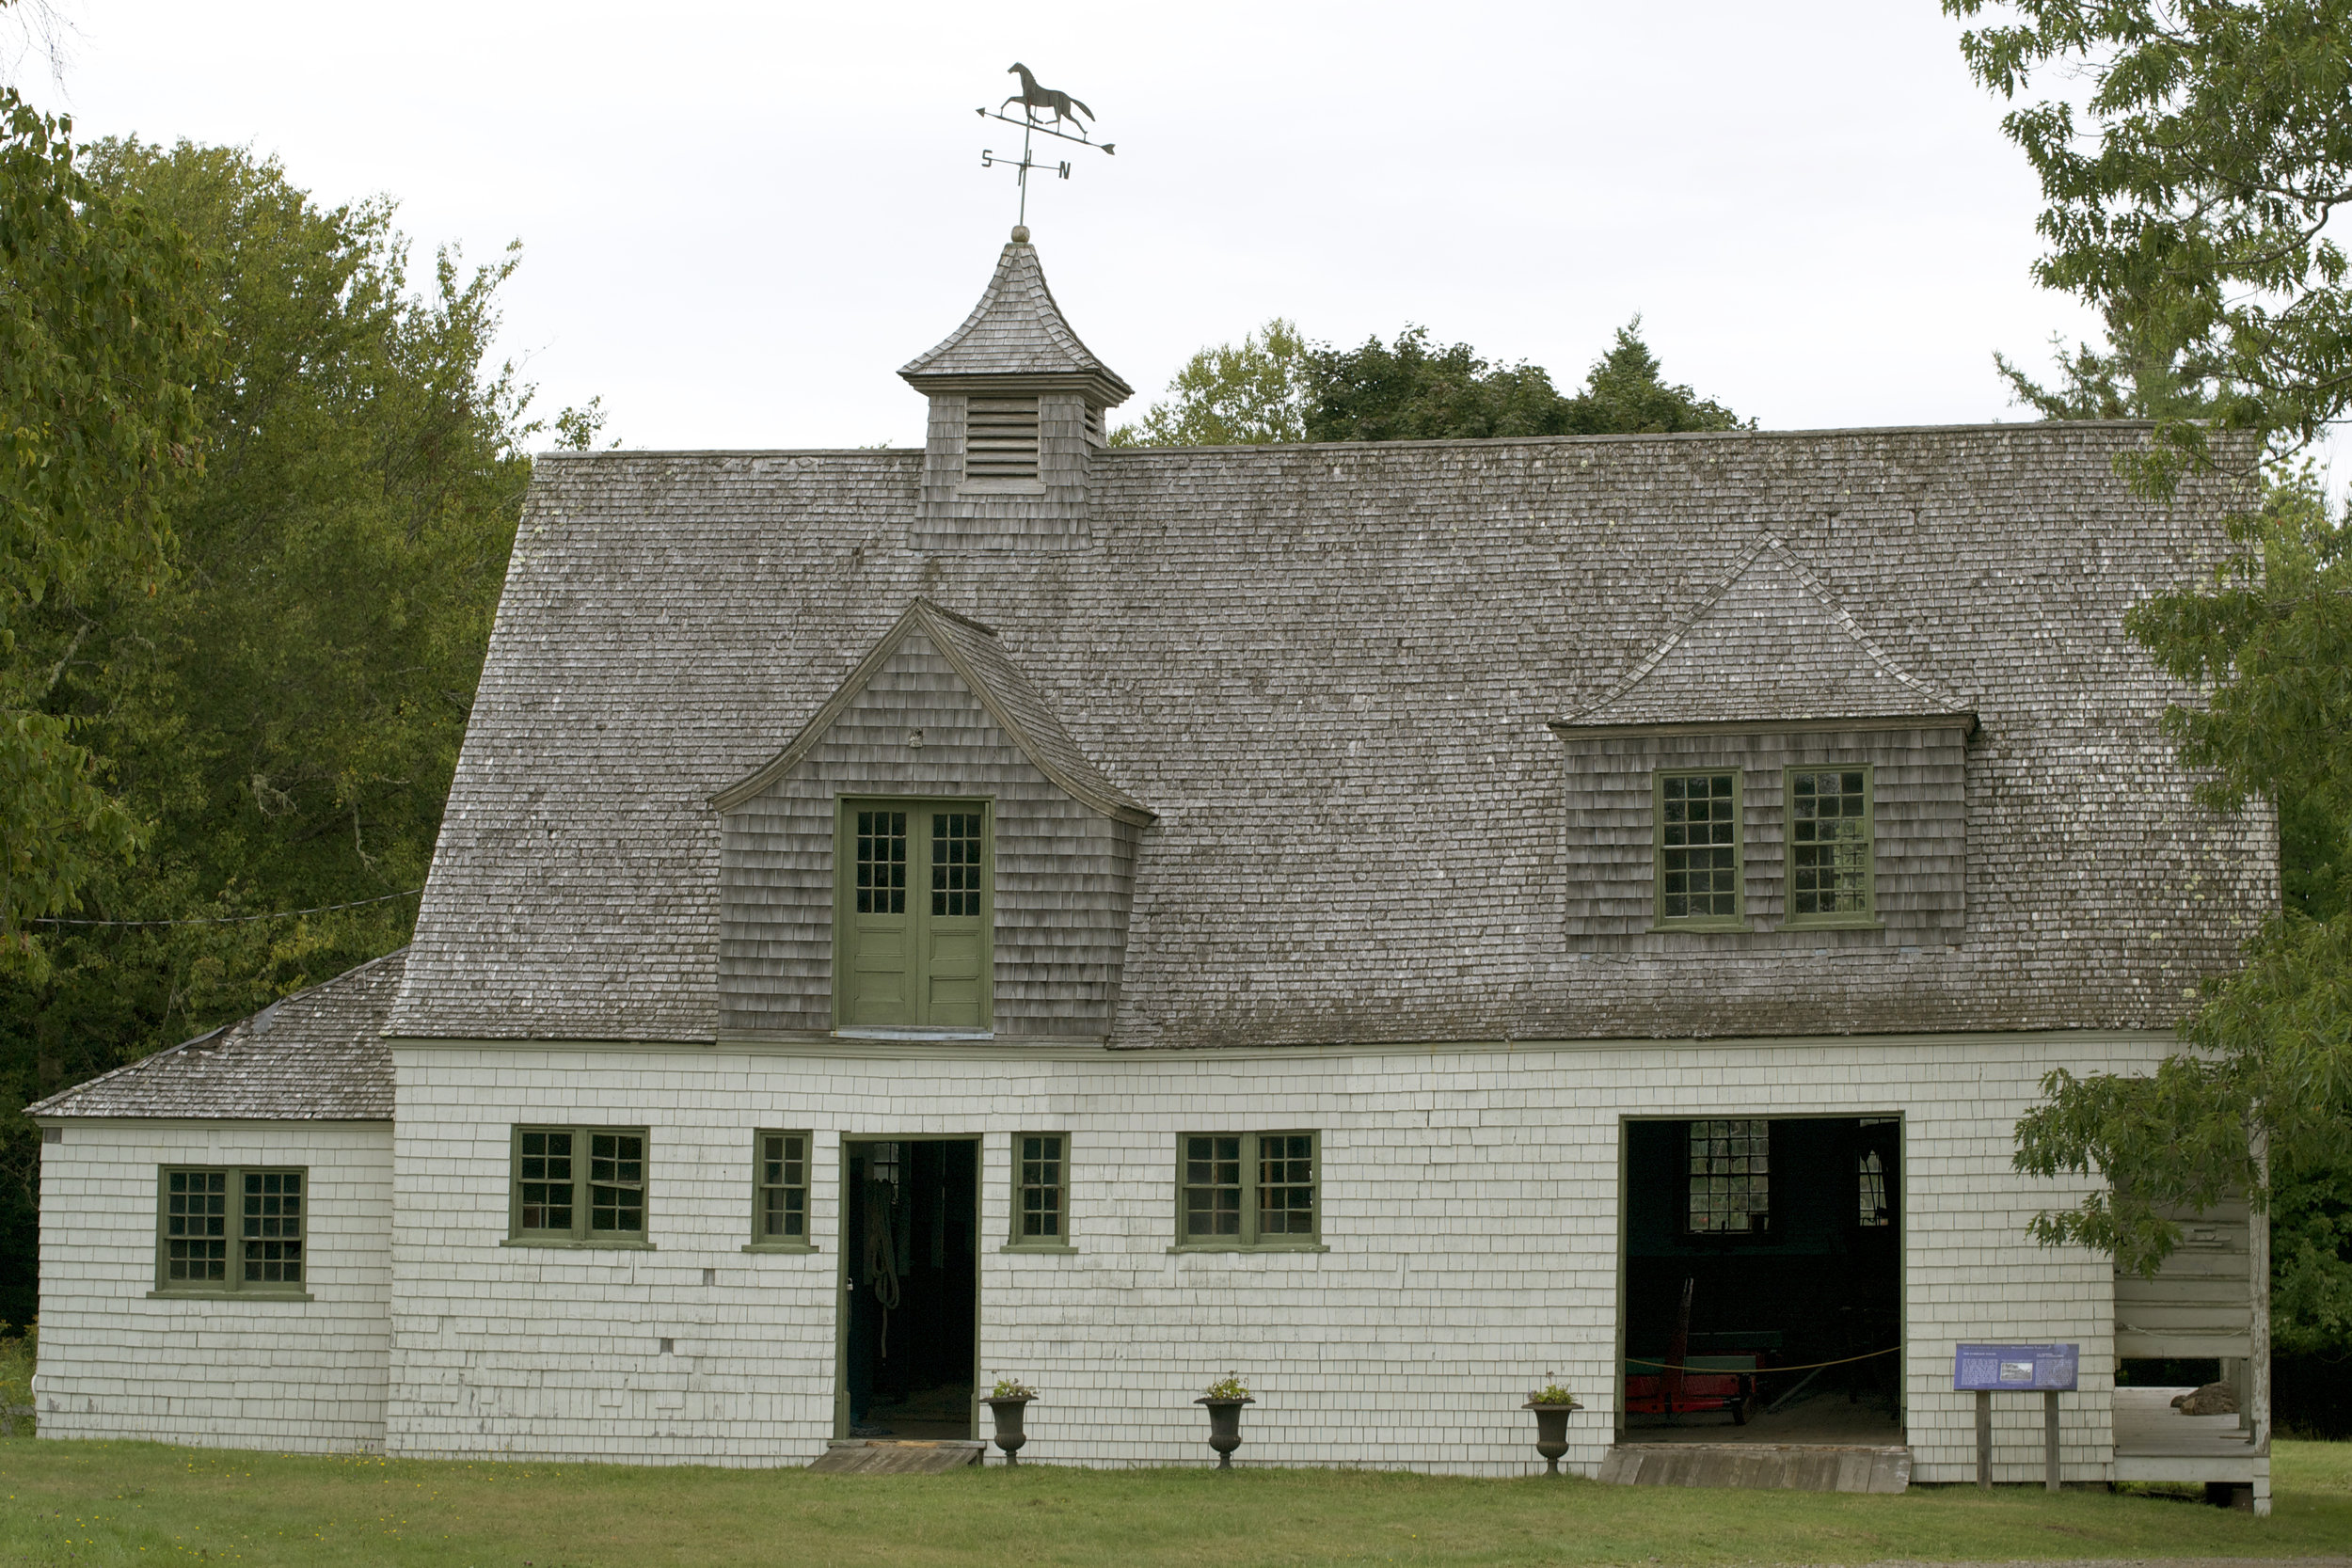 sweet-shed-behind-house.jpg